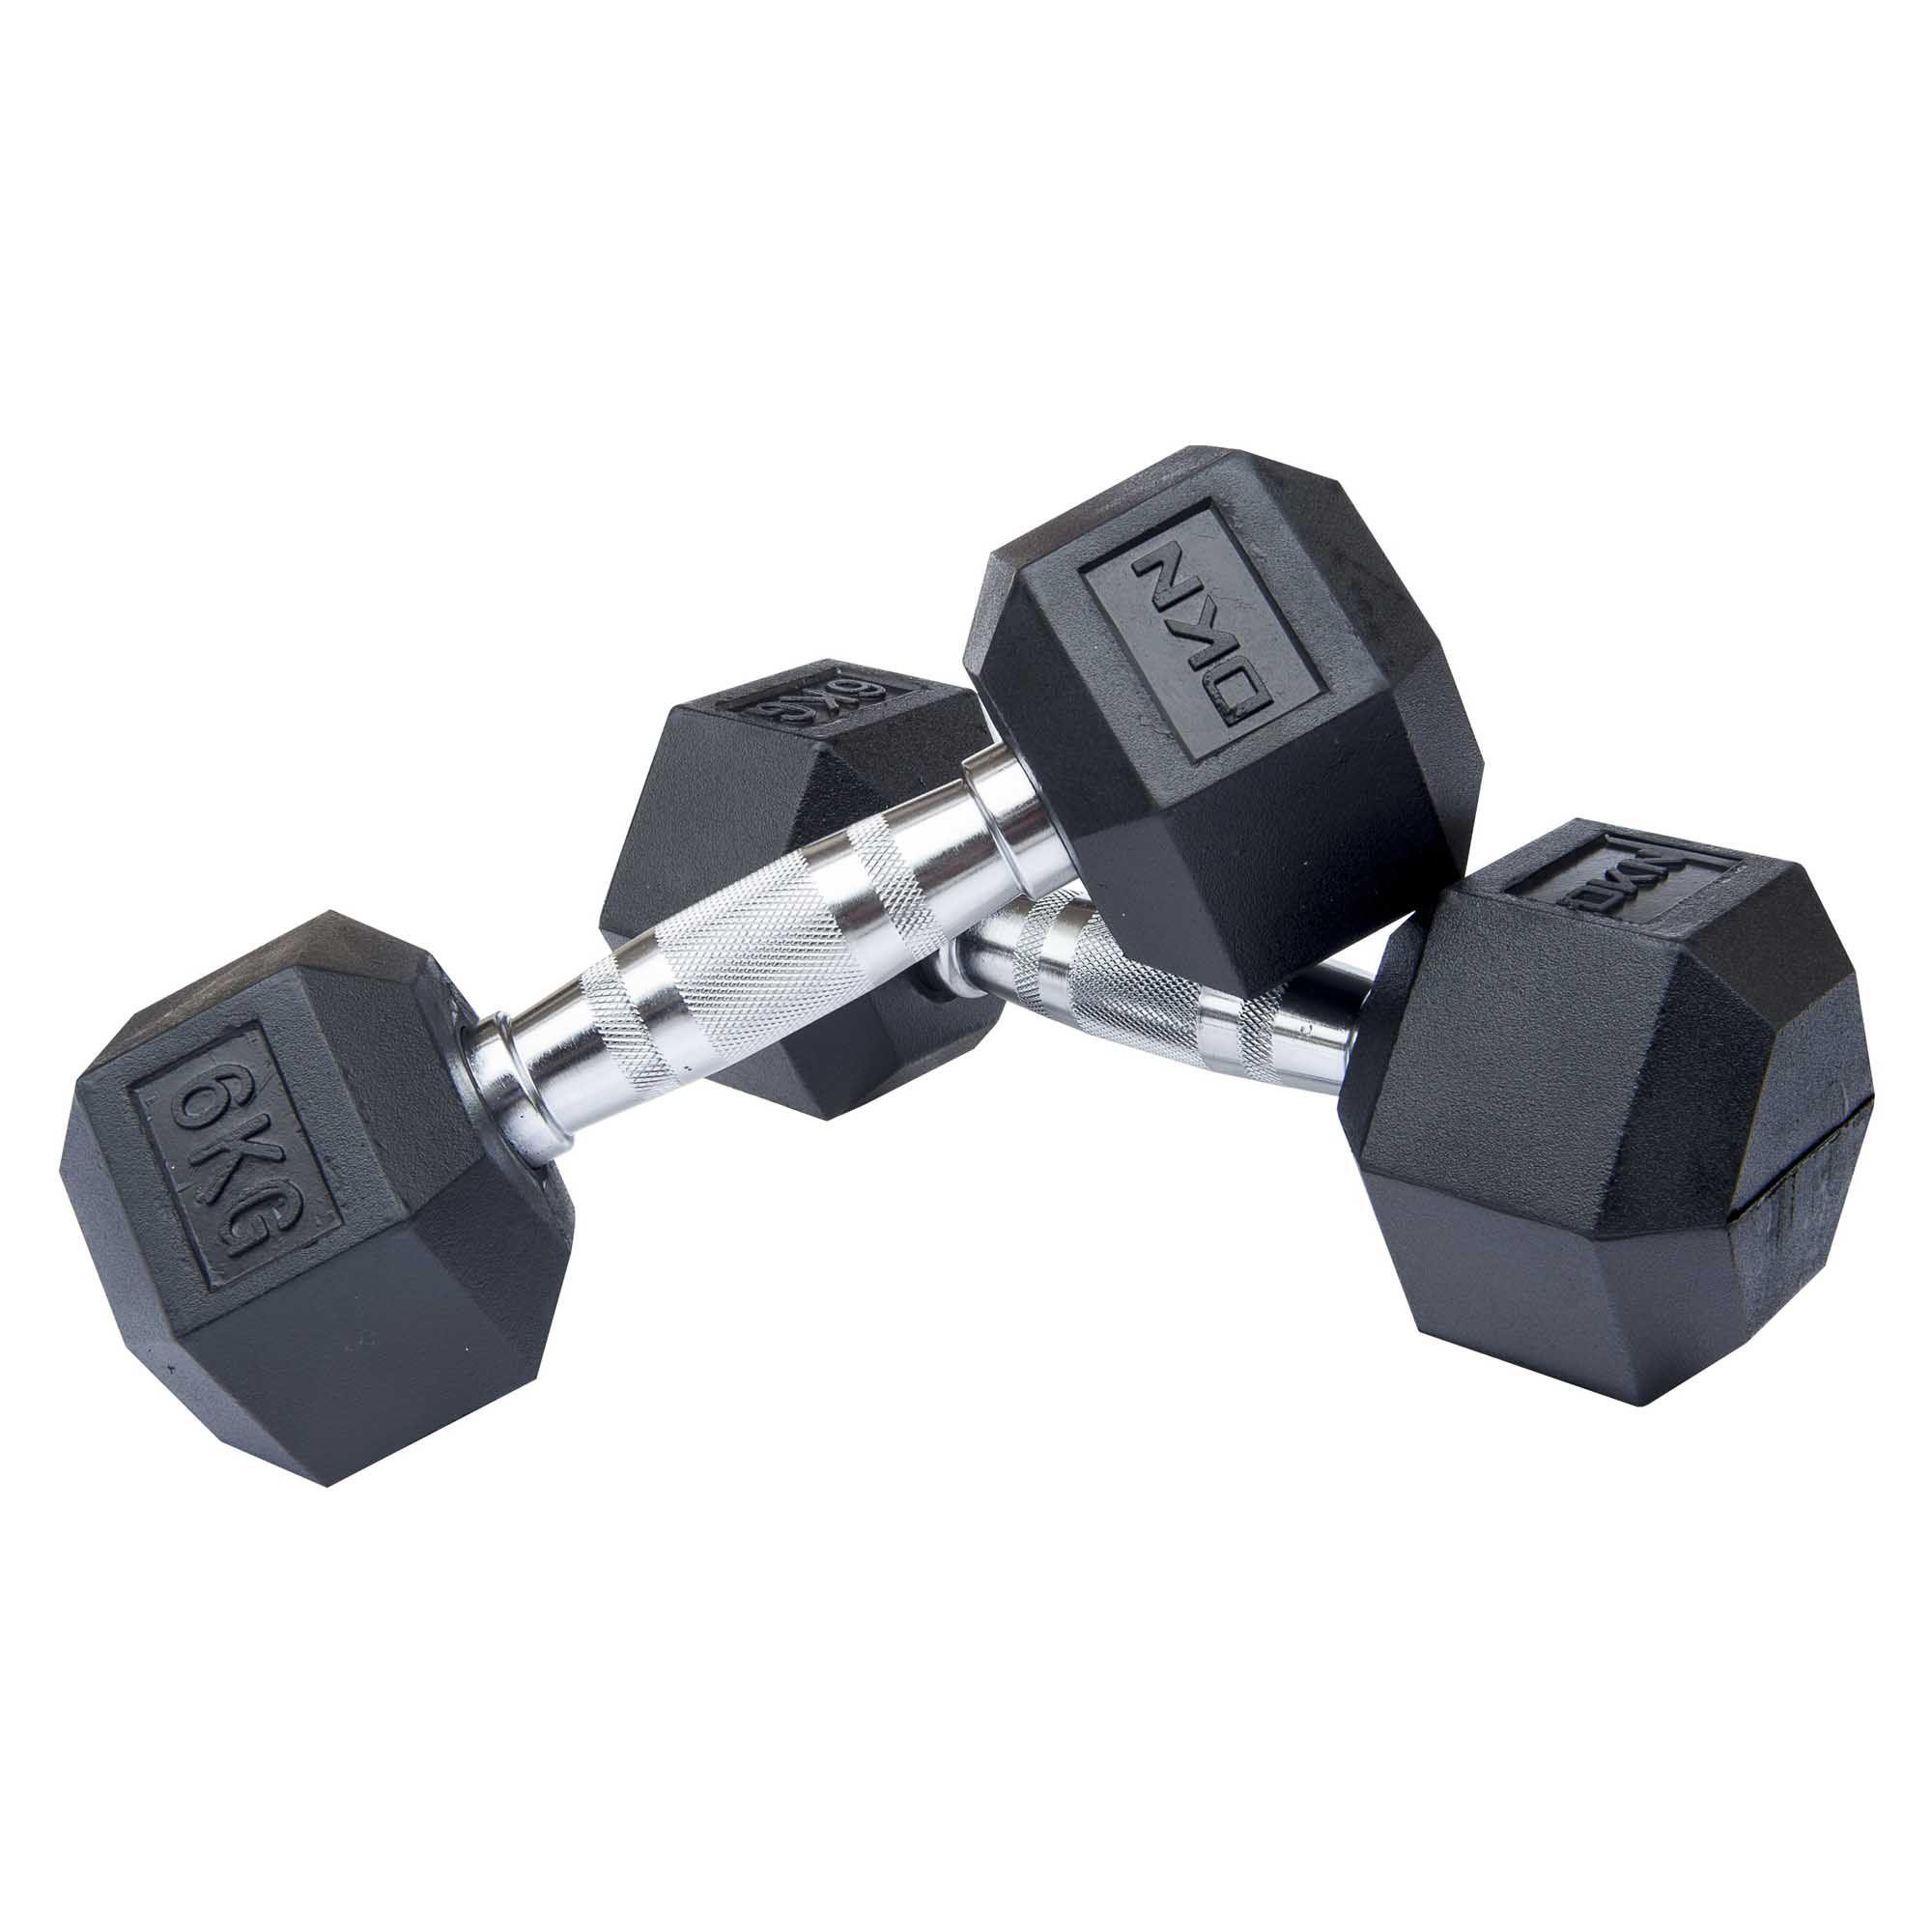 Dumbbell Set Mr Price Sport: DKN 2kg To 10kg Rubber Hex Dumbbell Set With Storage Rack